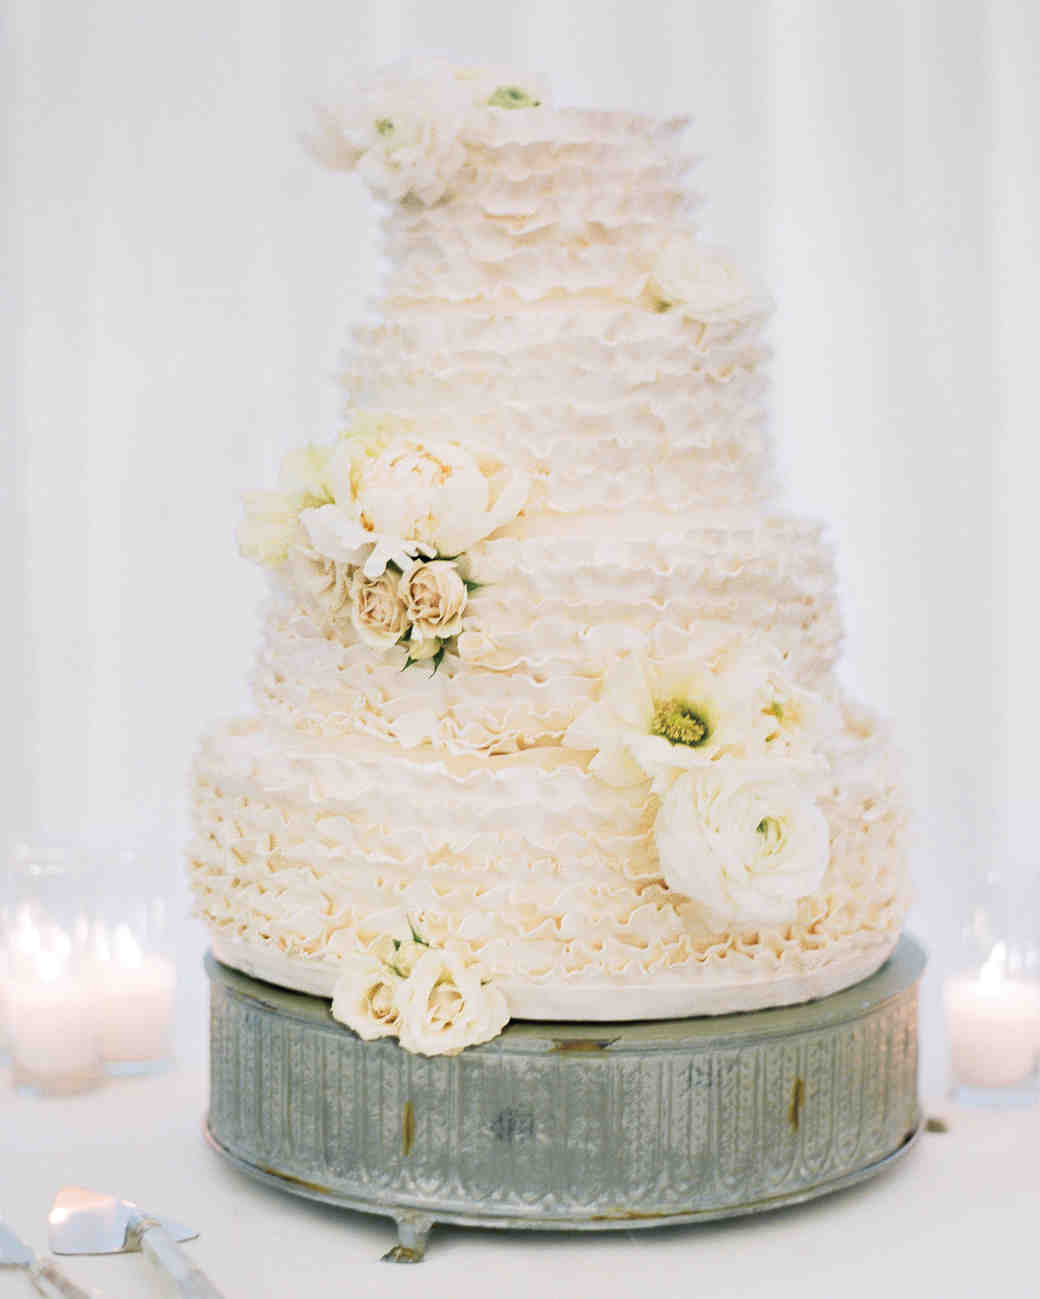 25 New Takes On Traditional Wedding Cake Flavors | Martha Stewart Weddings